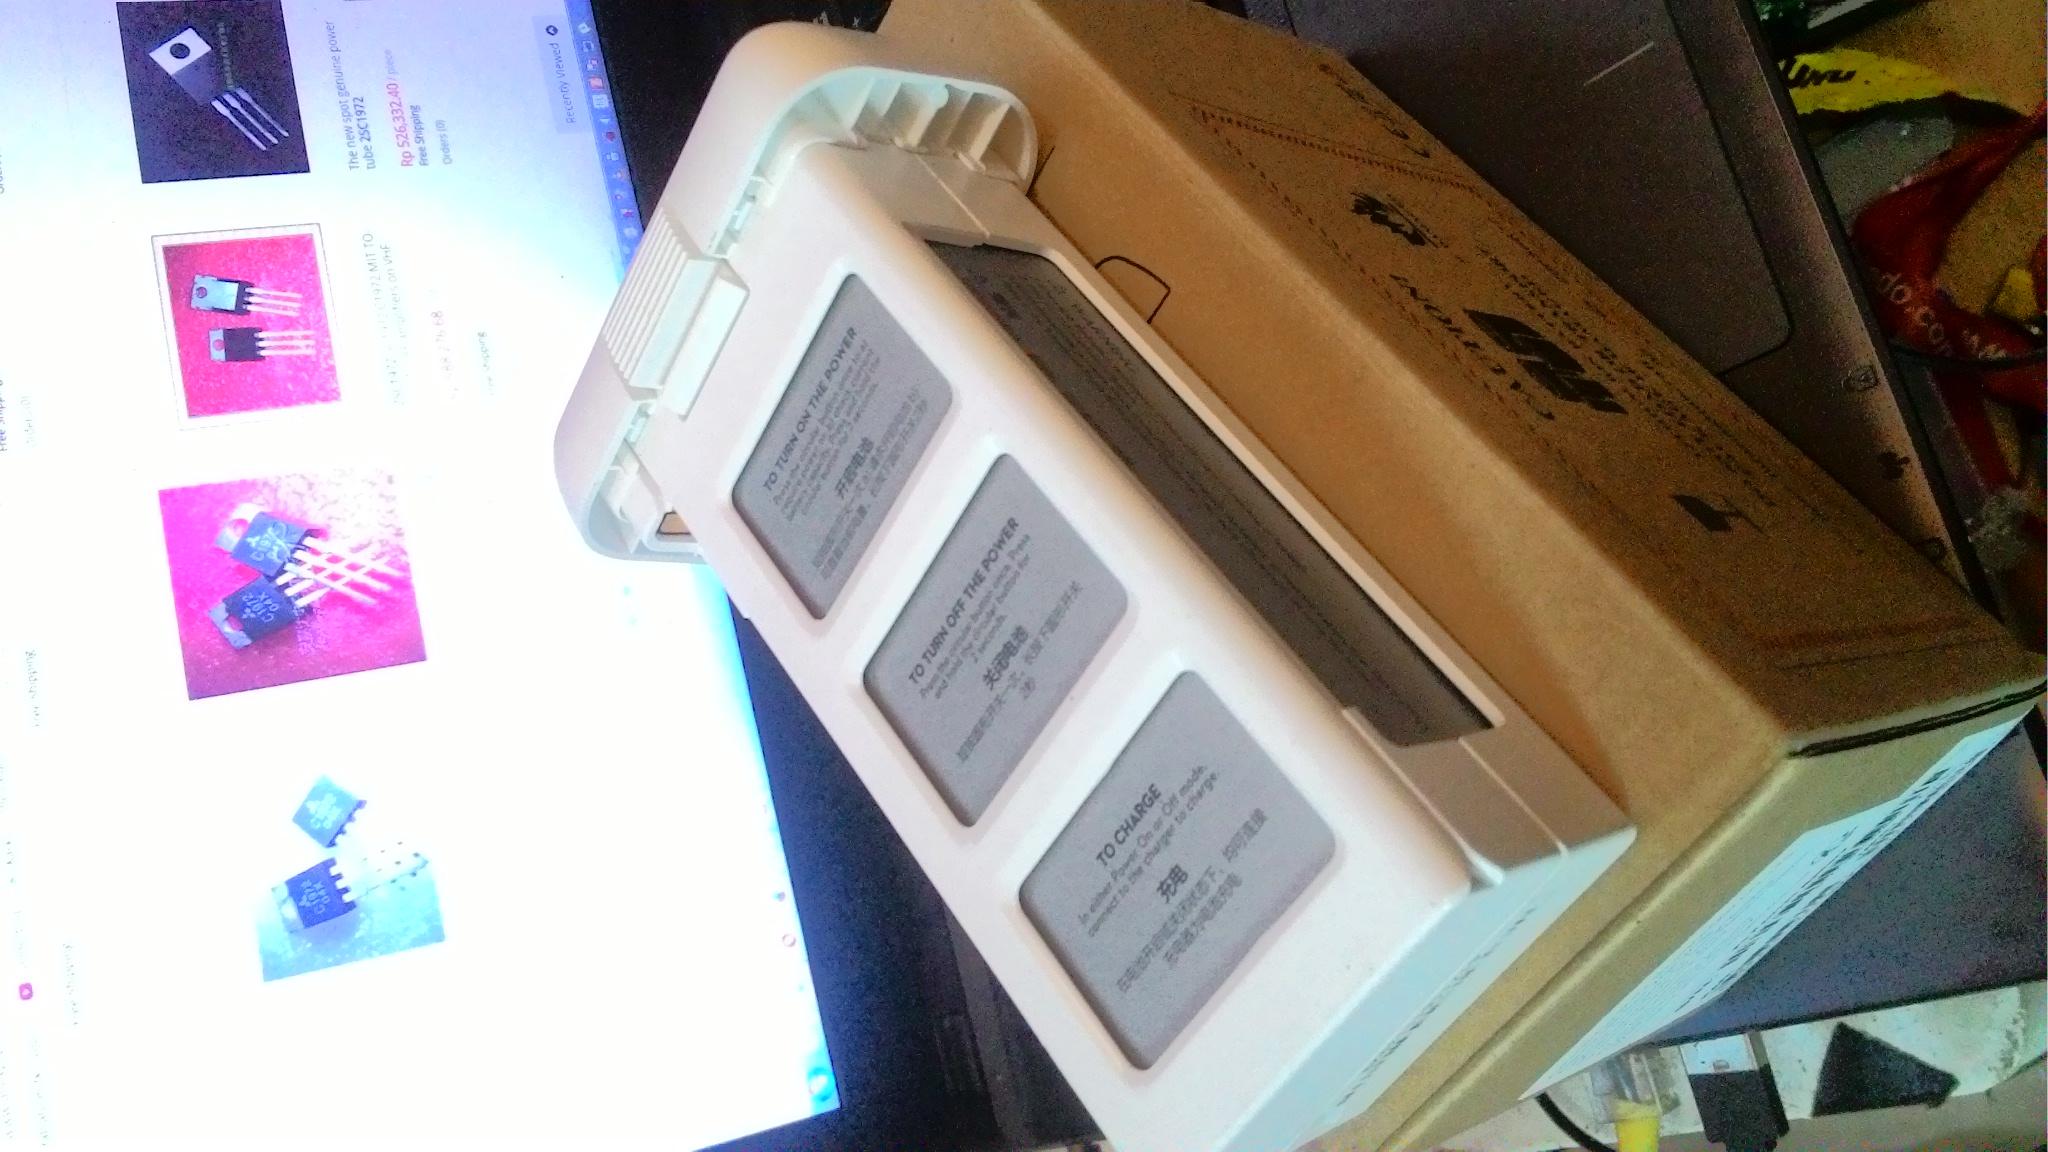 Jual Baterai Dji Phantom 3 Original Adv Pro Standard Battery Intelligent Flight Batere Clasikshop Tokopedia